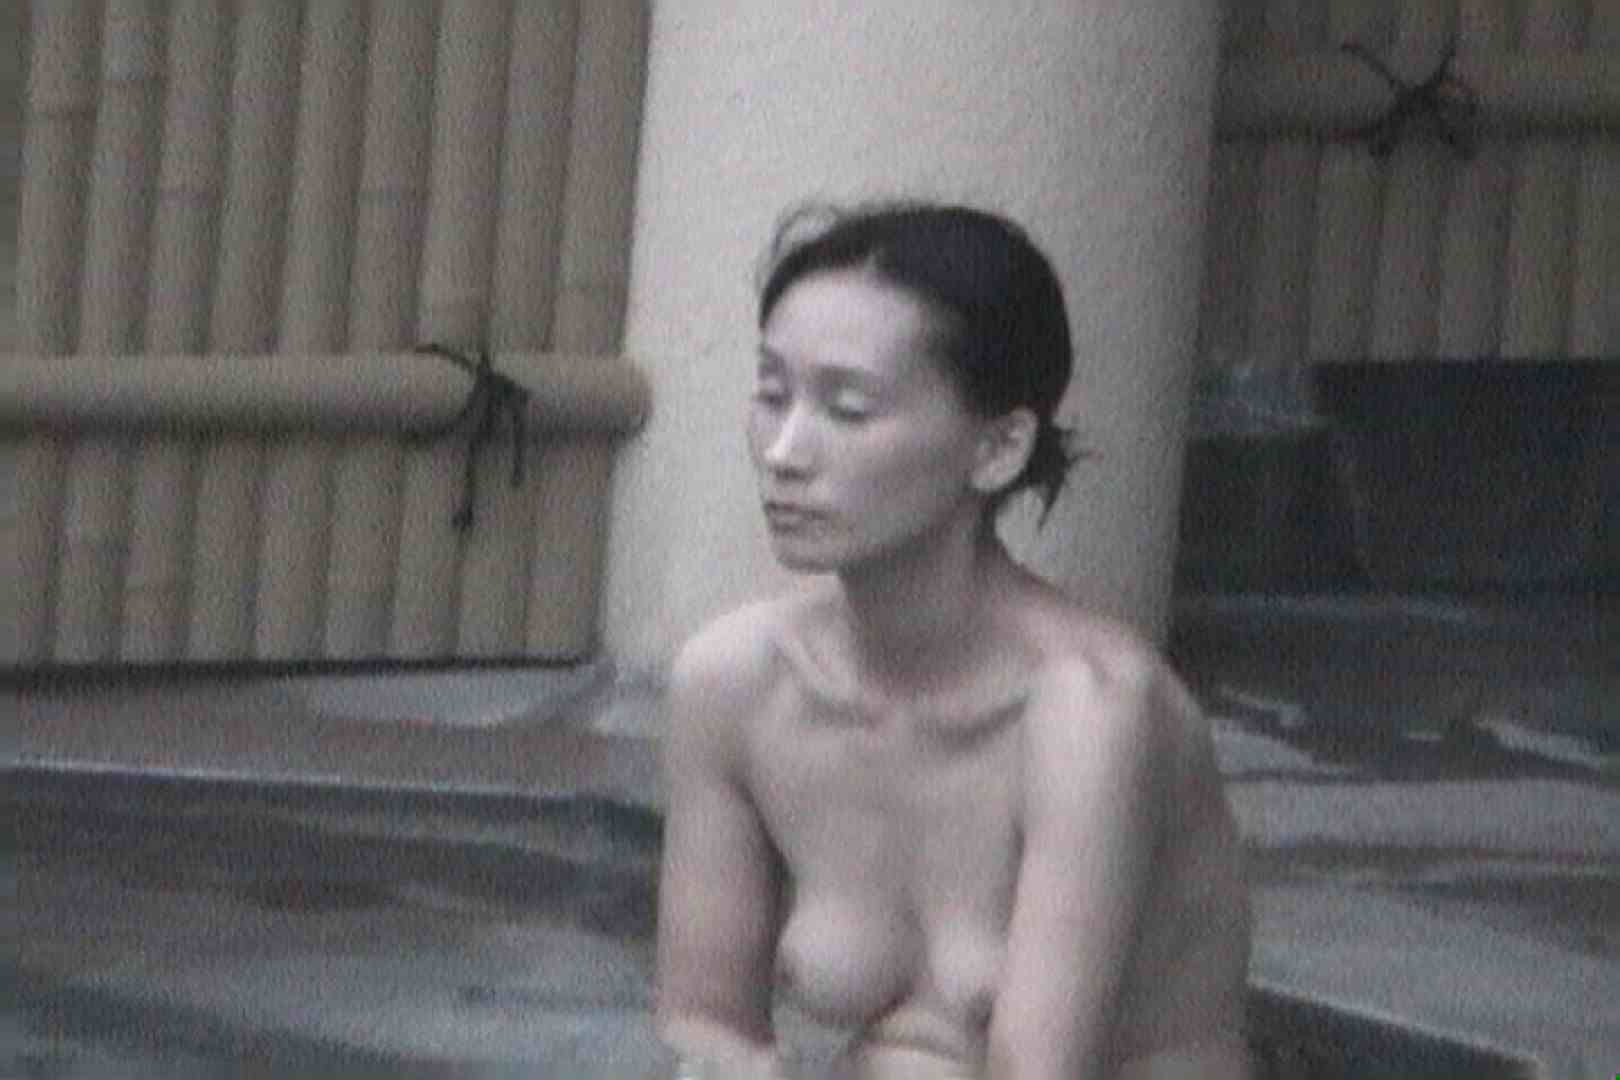 Aquaな露天風呂Vol.557 盗撮映像  23Pix 21